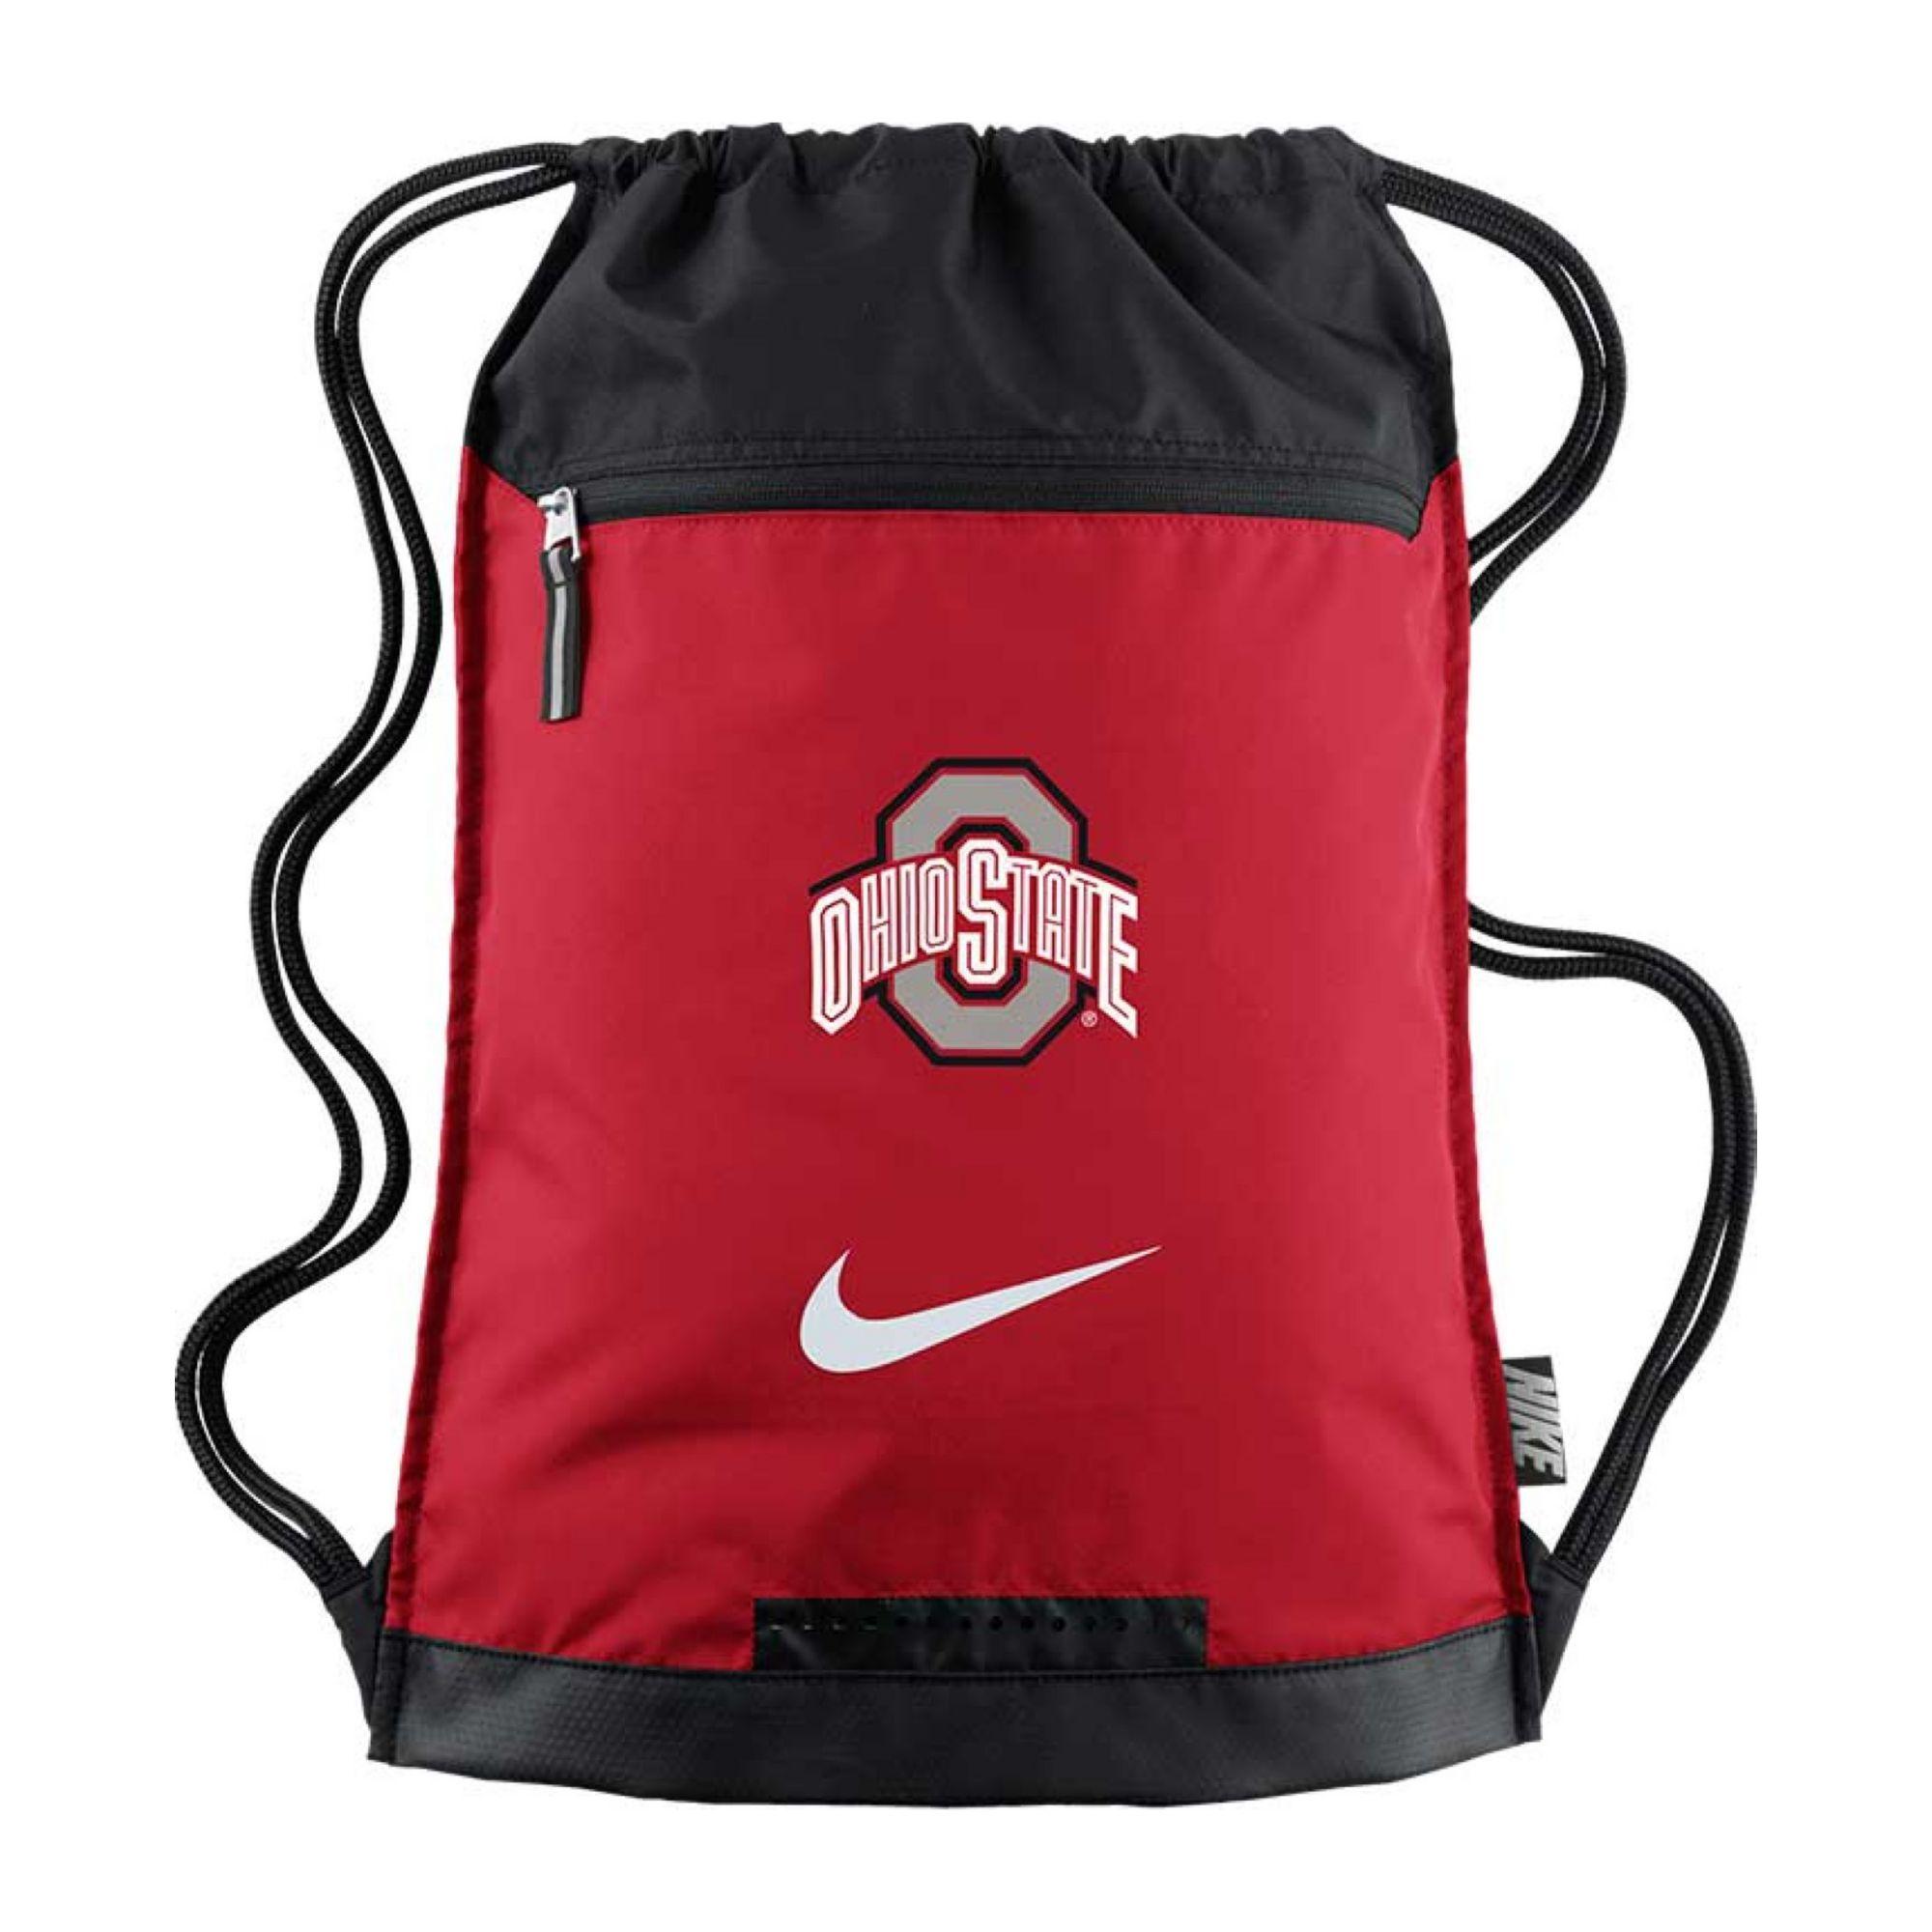 Gym Bag Jansport: Nike Ohio State Buckeyes Training Gym Bag In Red For Men